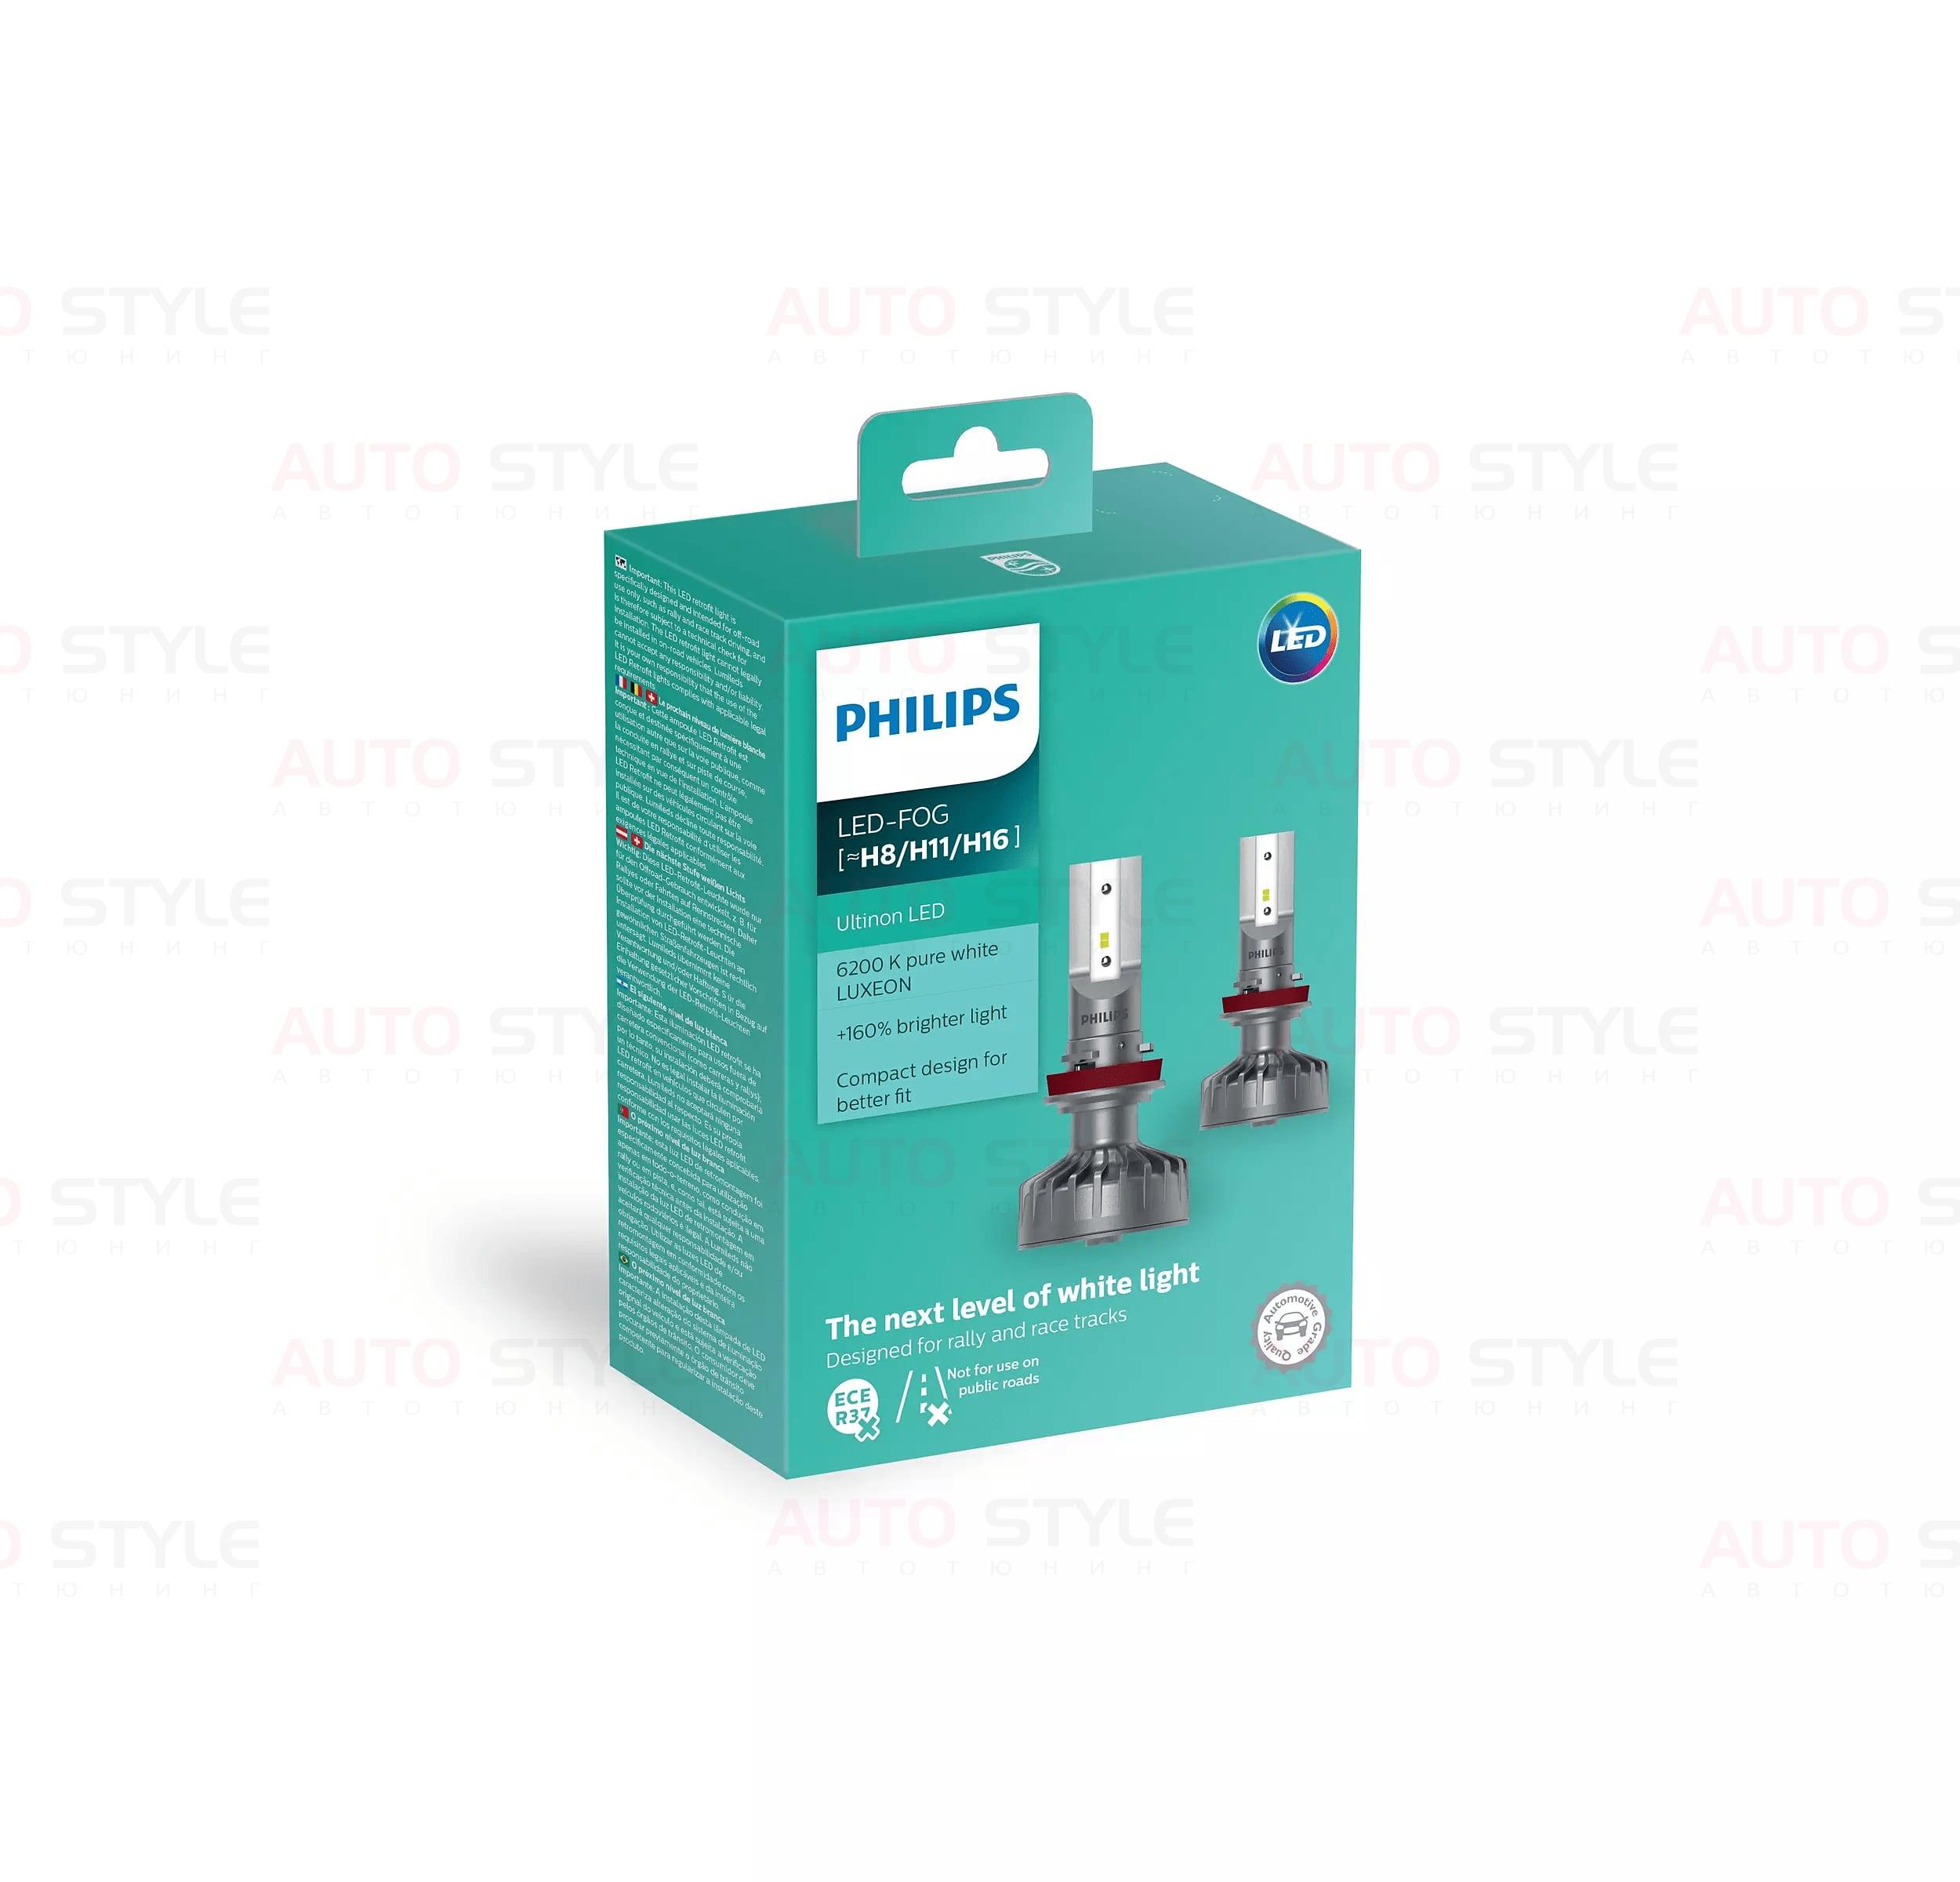 LED лампа Philips Ultion +160% H8/H11/H16 11366ULWX2 (2 шт.) LED лампы Philips Ultion +160% H8/H11/H16 11366ULWX2 (2 шт.)